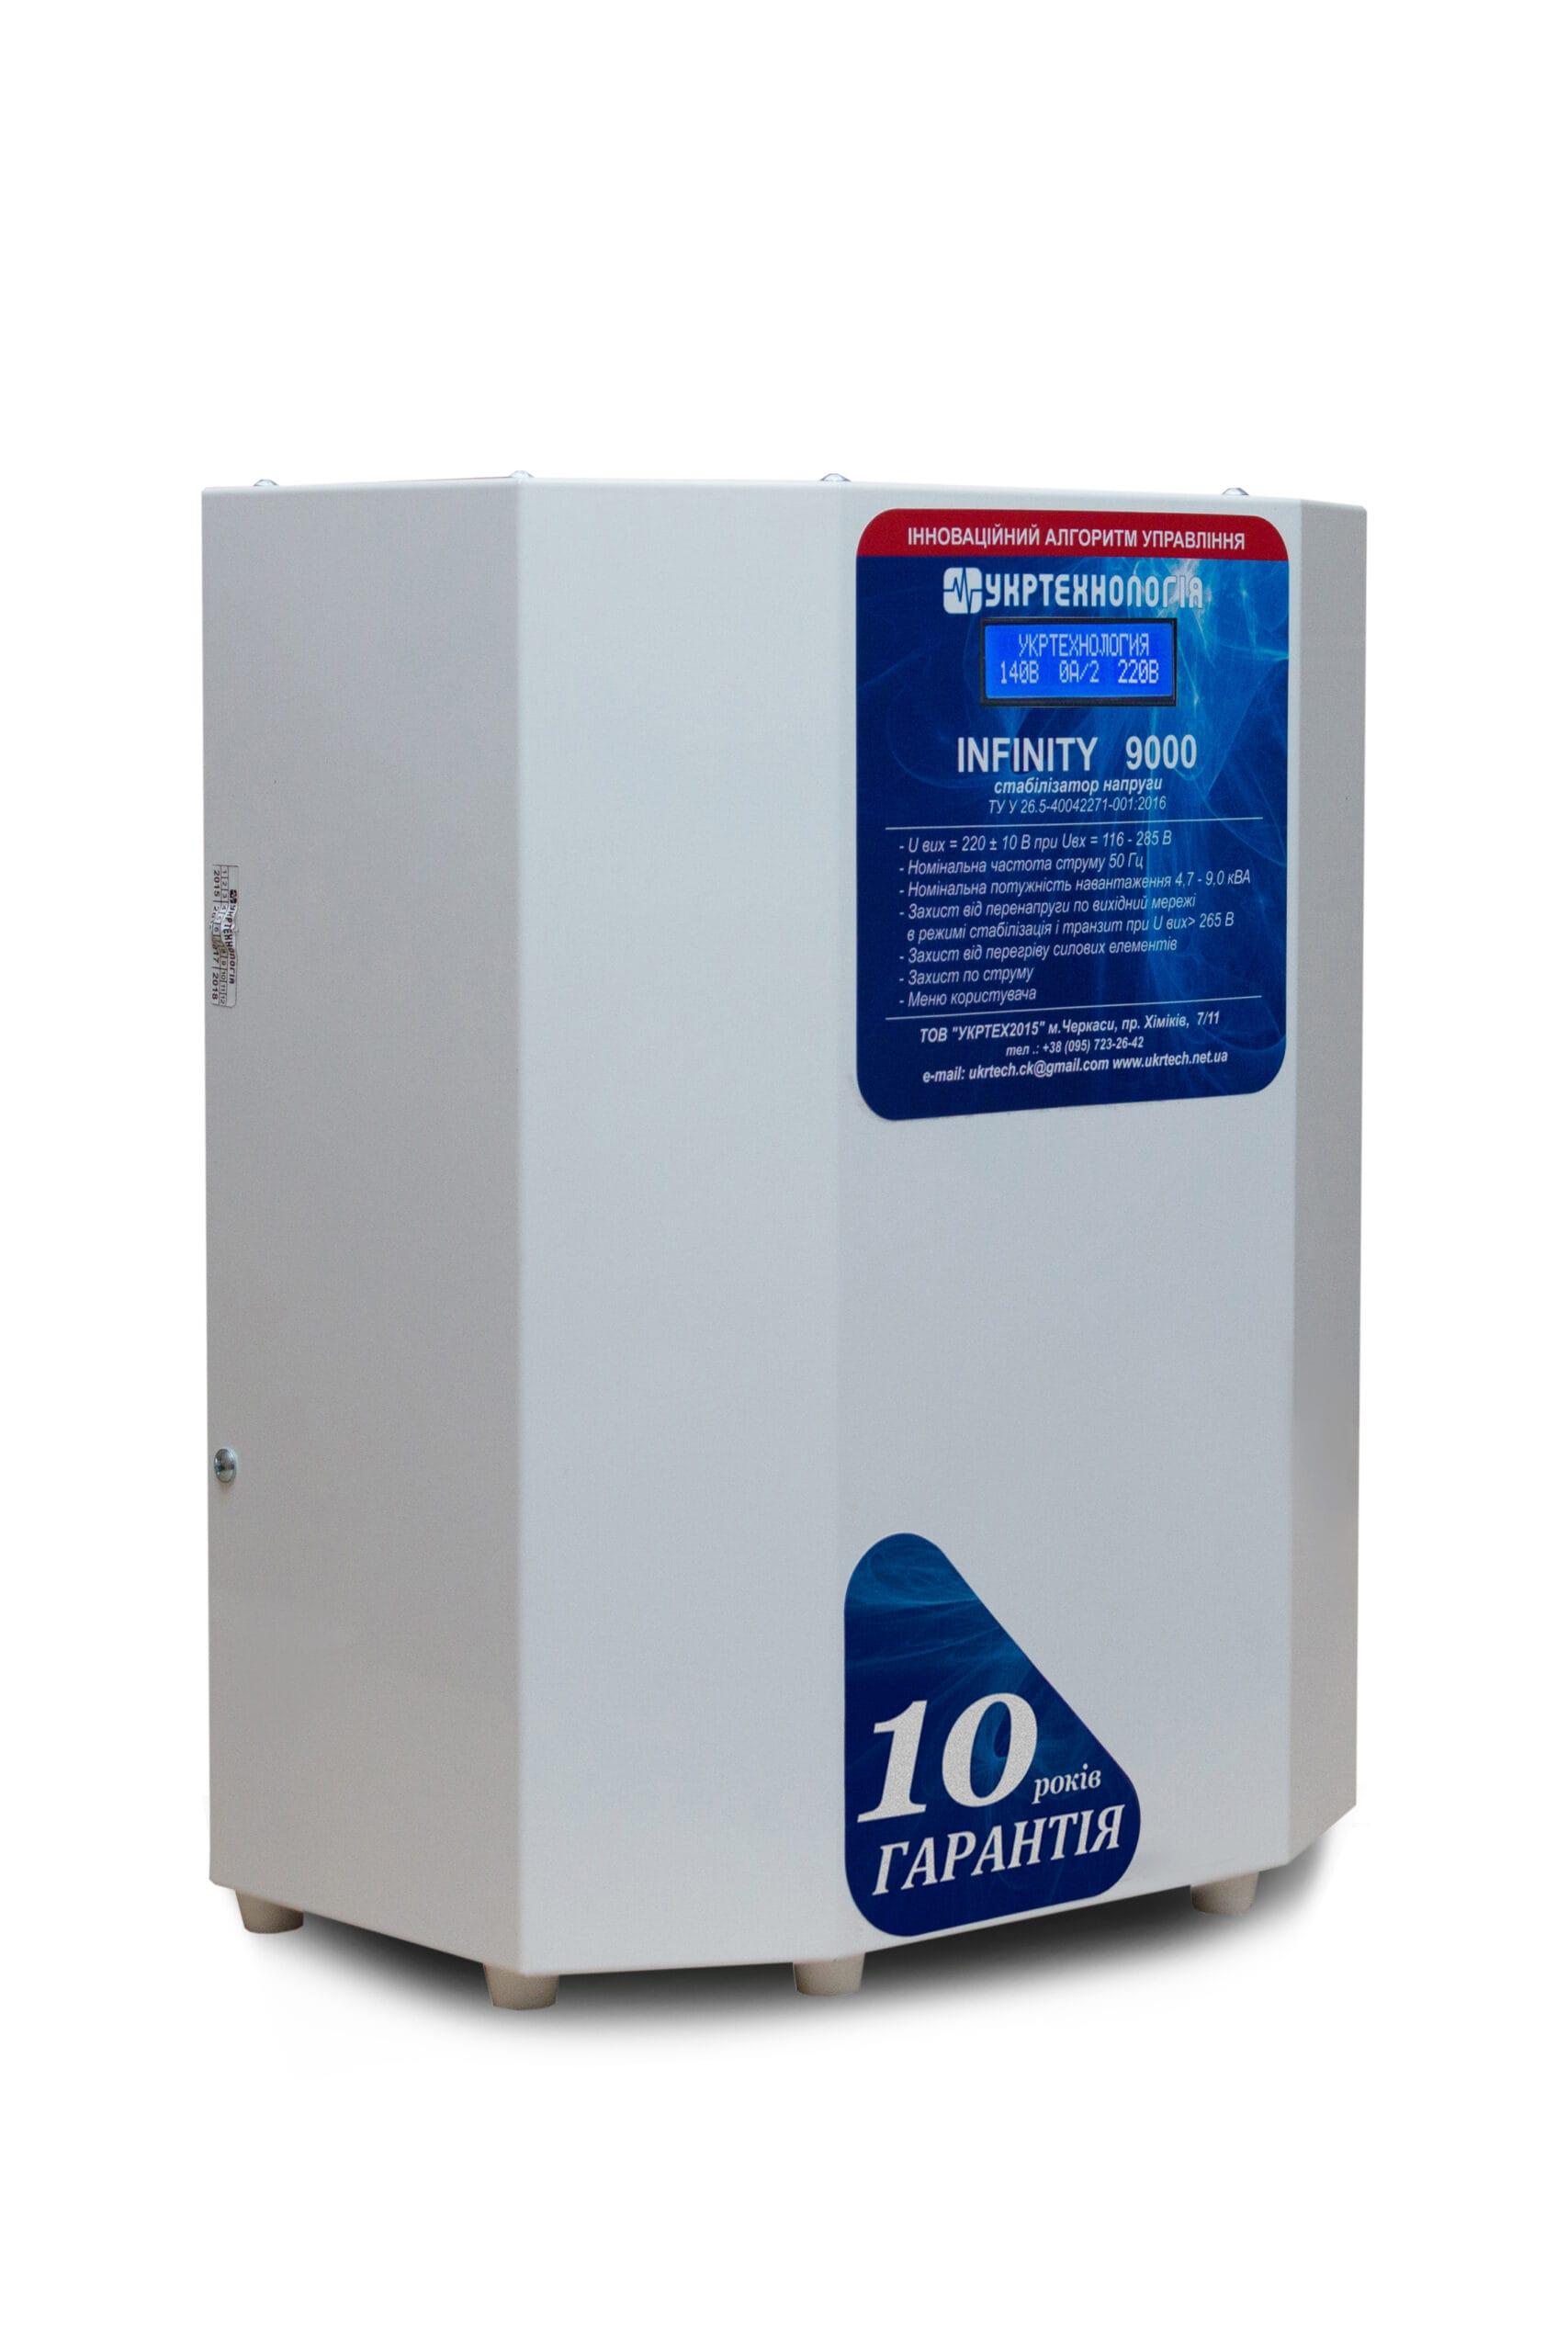 Стабилизаторы напряжения - Стабилизатор напряжения 9 кВт INFINITY 000001412 - Фото 2